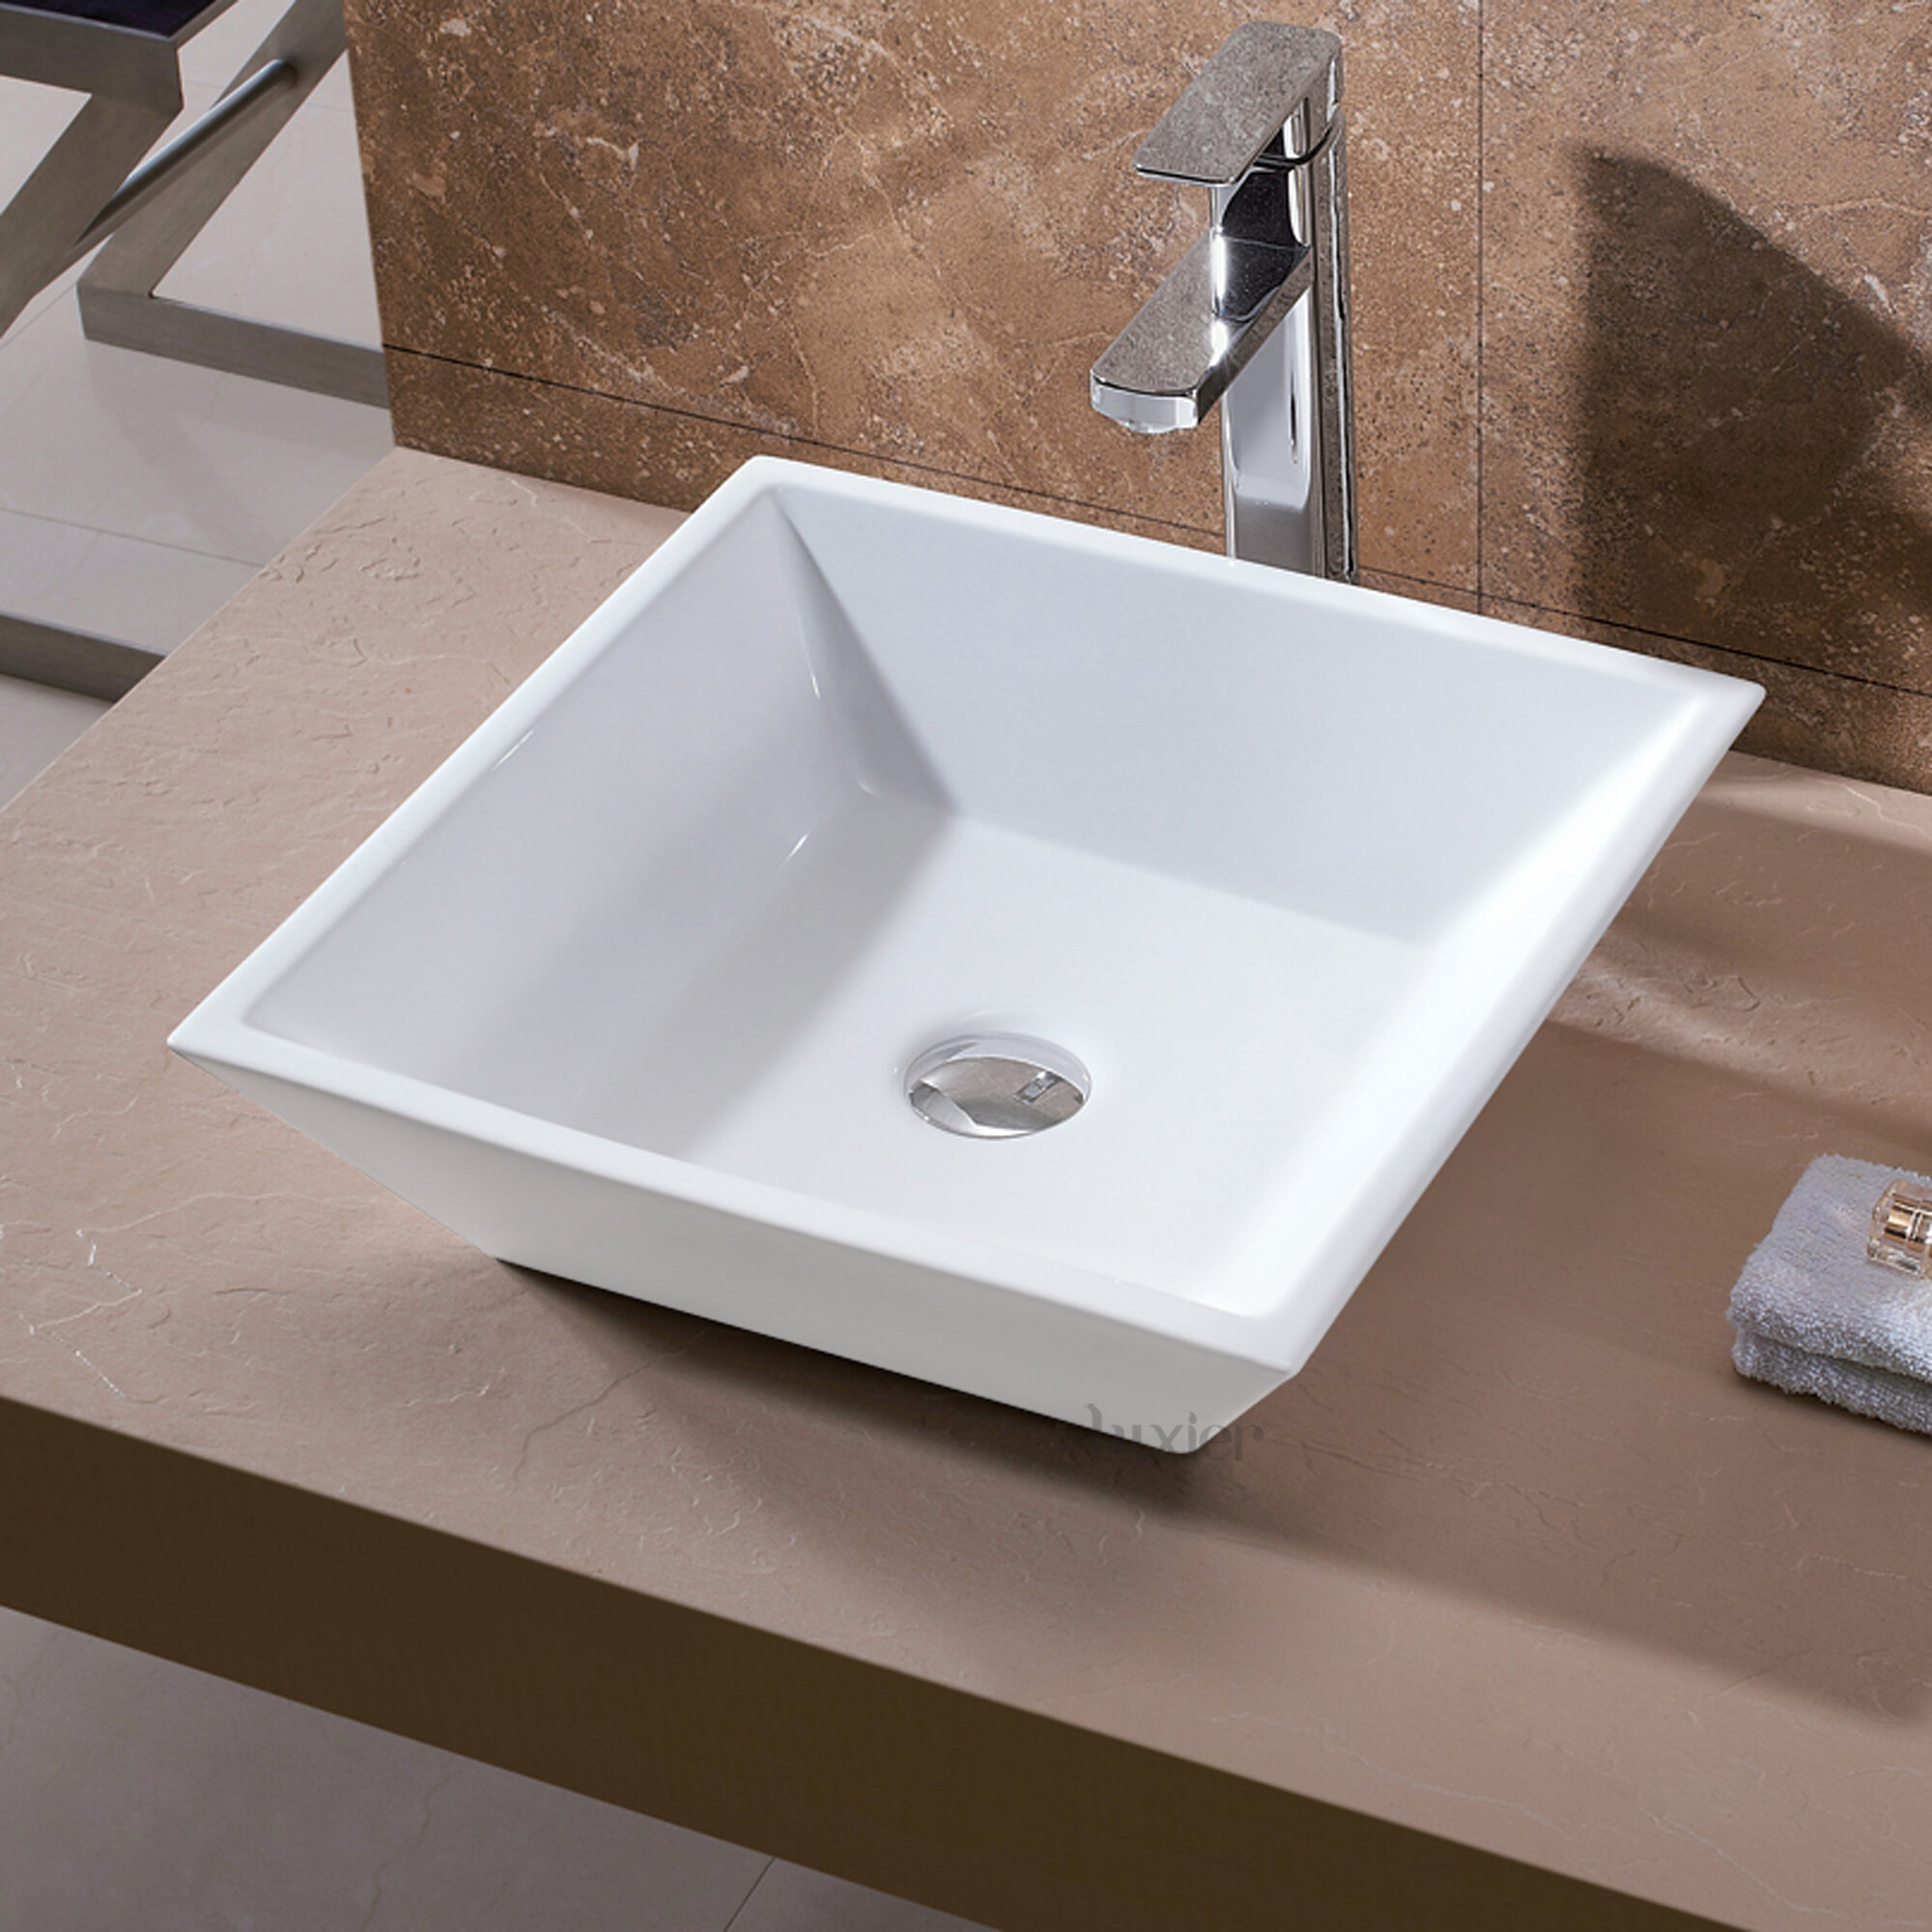 Square Bathroom Sinks Youll Love Wayfair